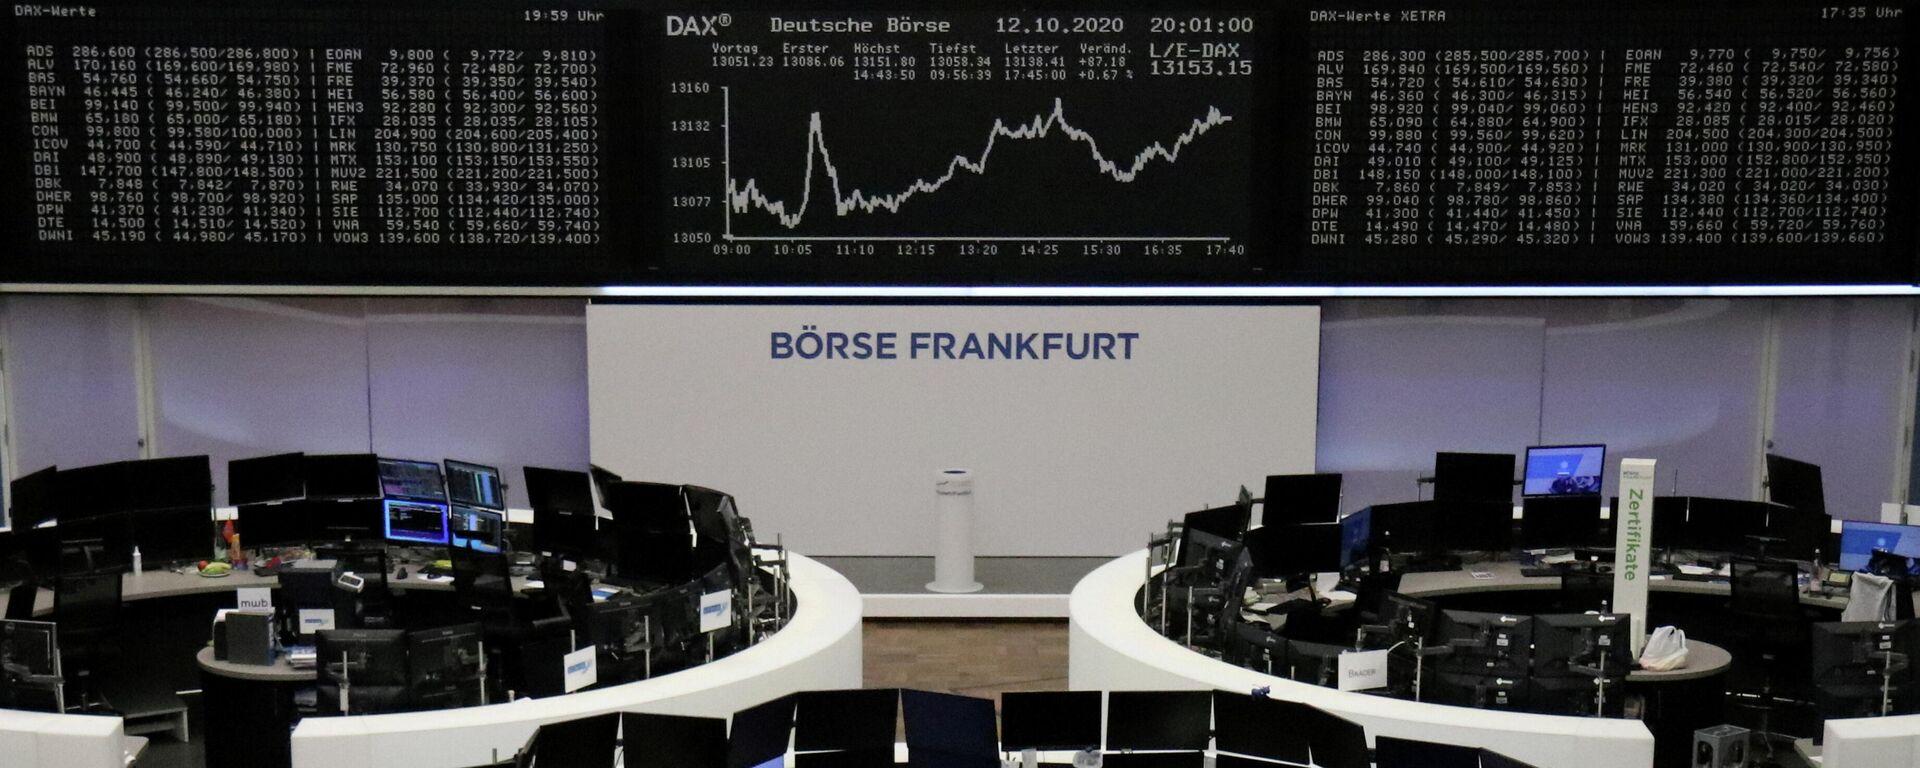 Dax-Index bei Börse Frankfurt - SNA, 1920, 09.08.2021